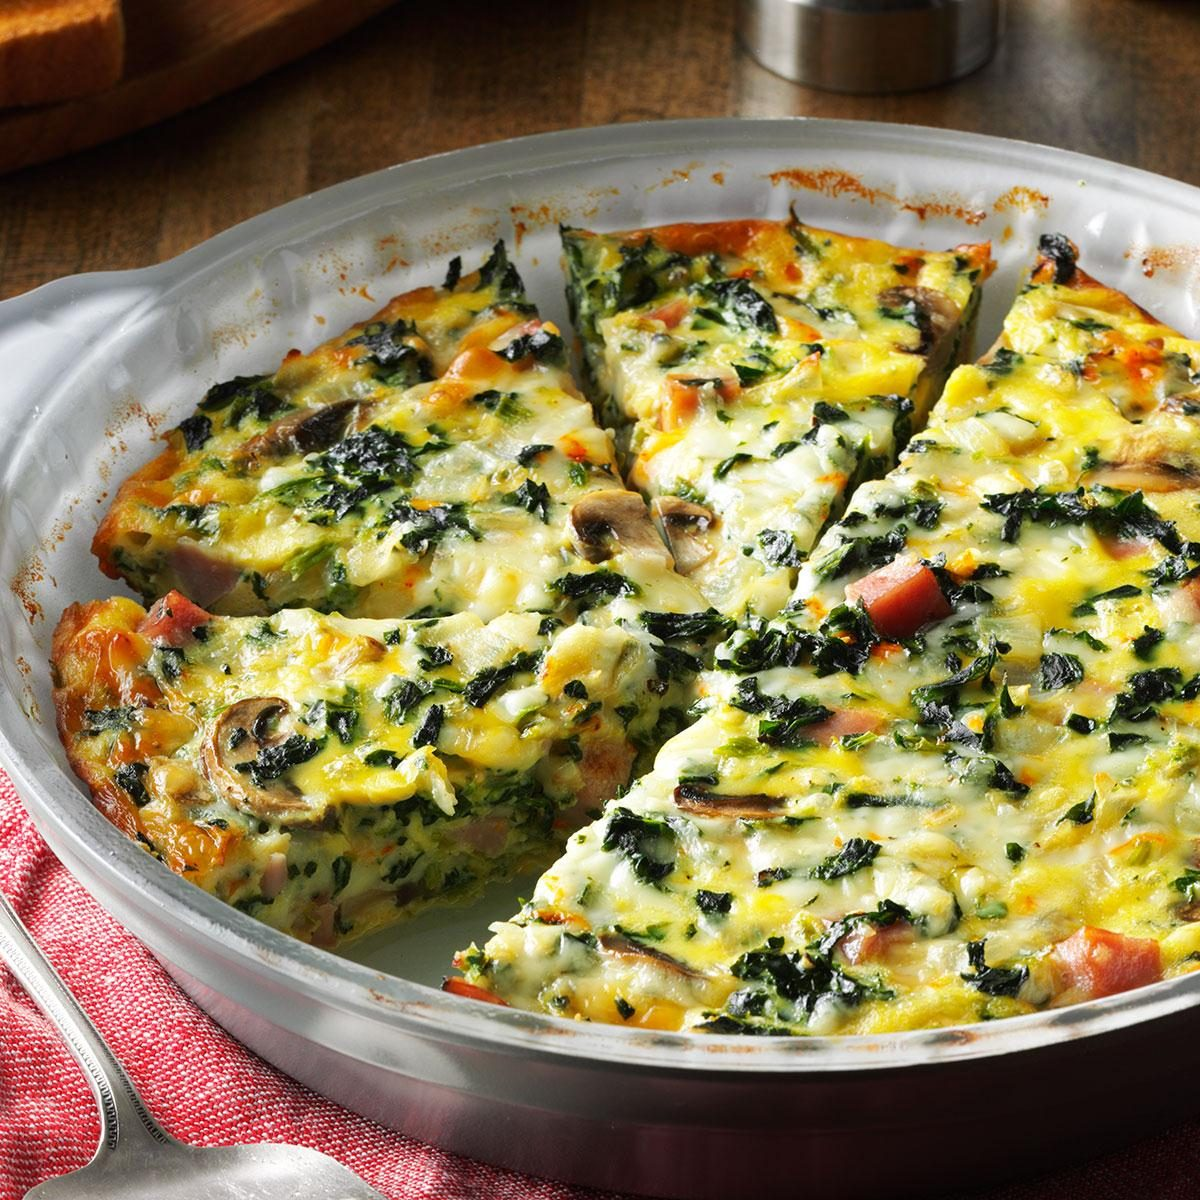 Crustless Spinach Quiche Recipe | Taste of Home